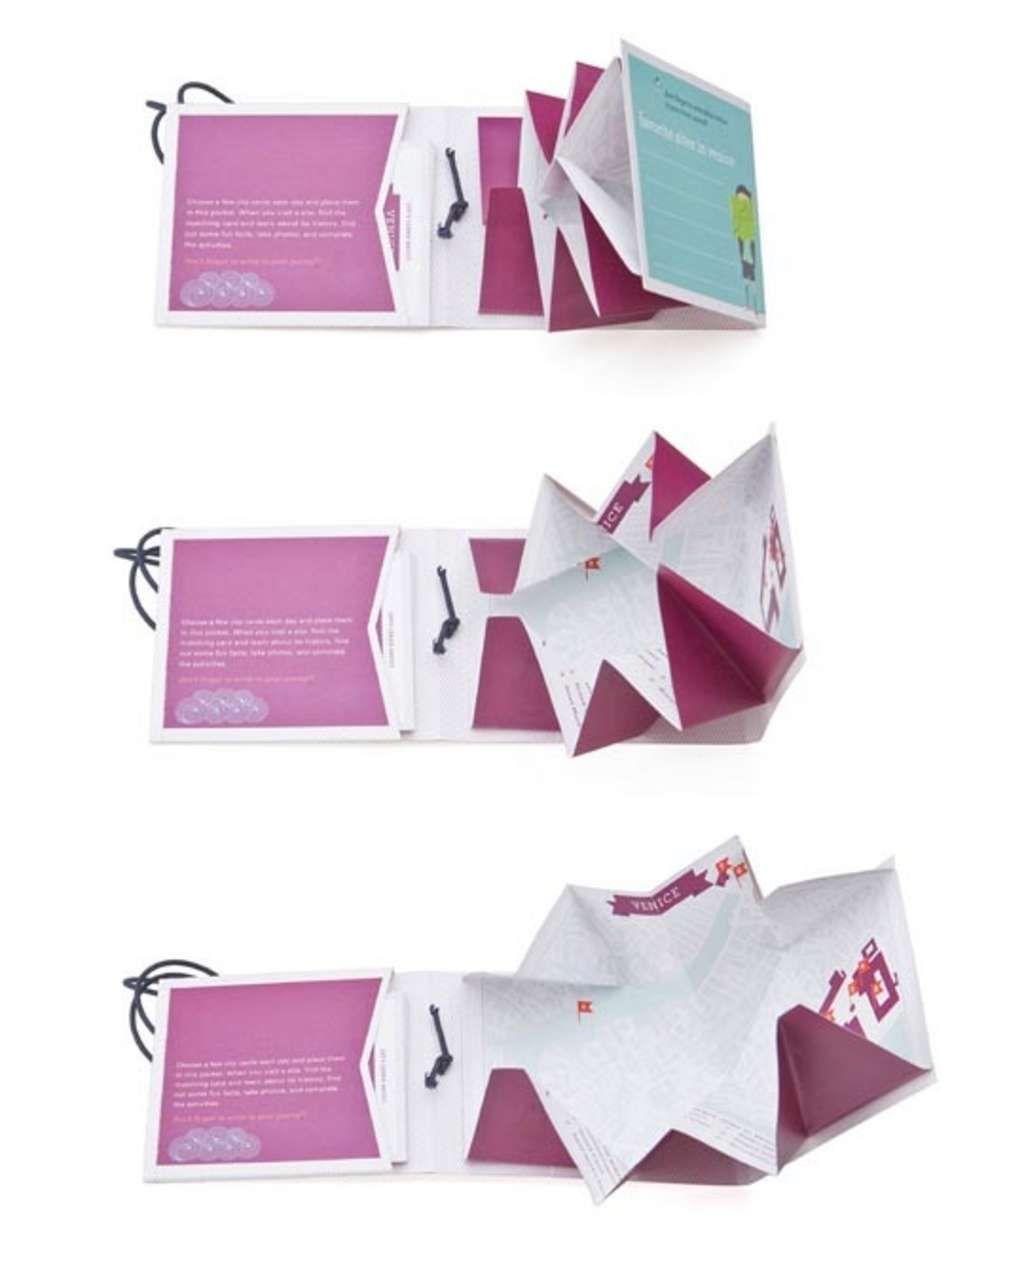 Zigzag Guides City Travel Guides For Kids Book Design Brochure Design Book Folding